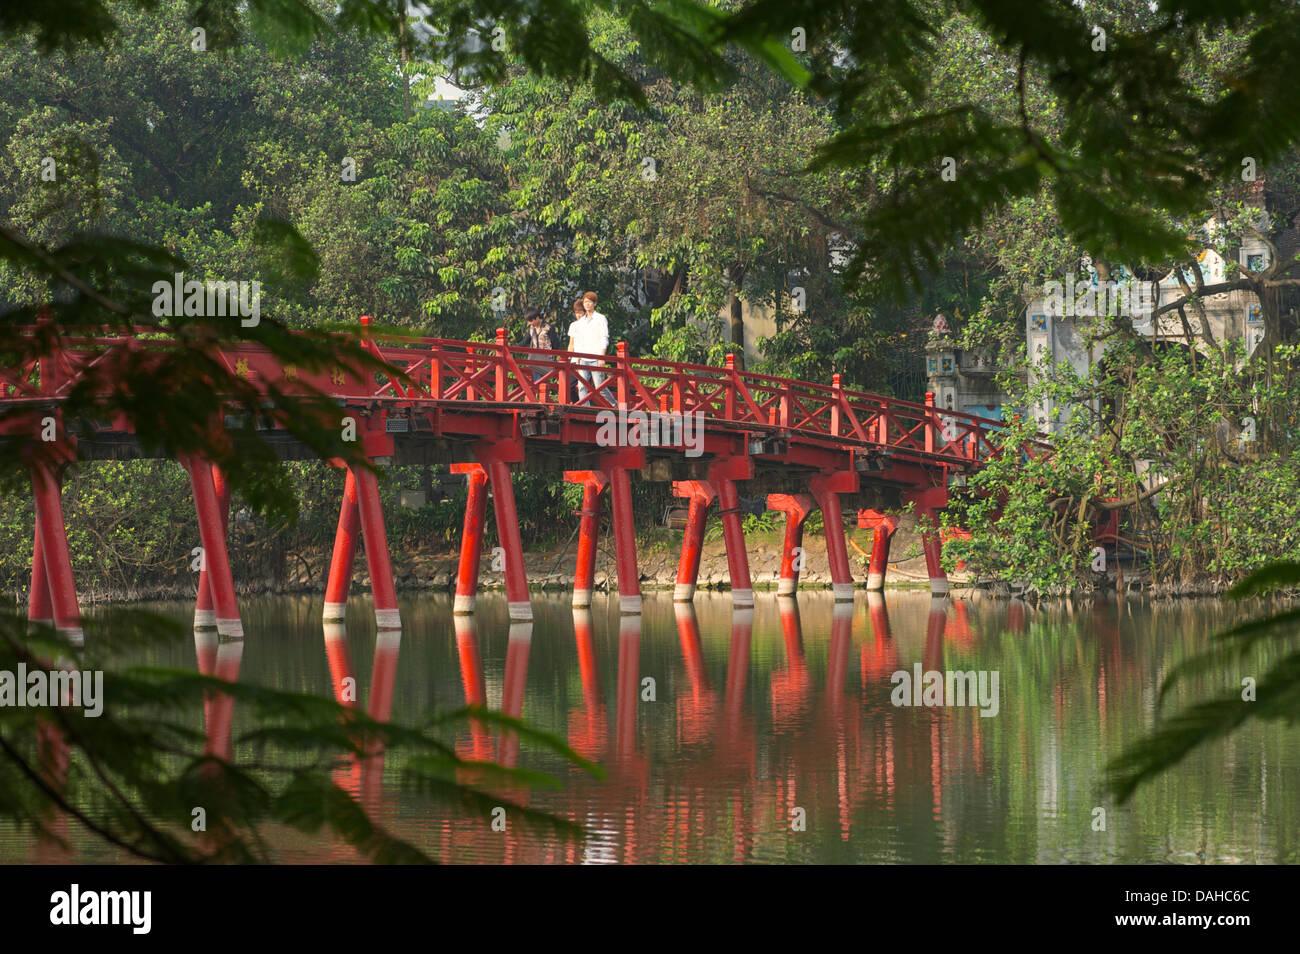 The Huc Bridge, Hoan Kiem Lake, Hanoi, Vietnam - Stock Image